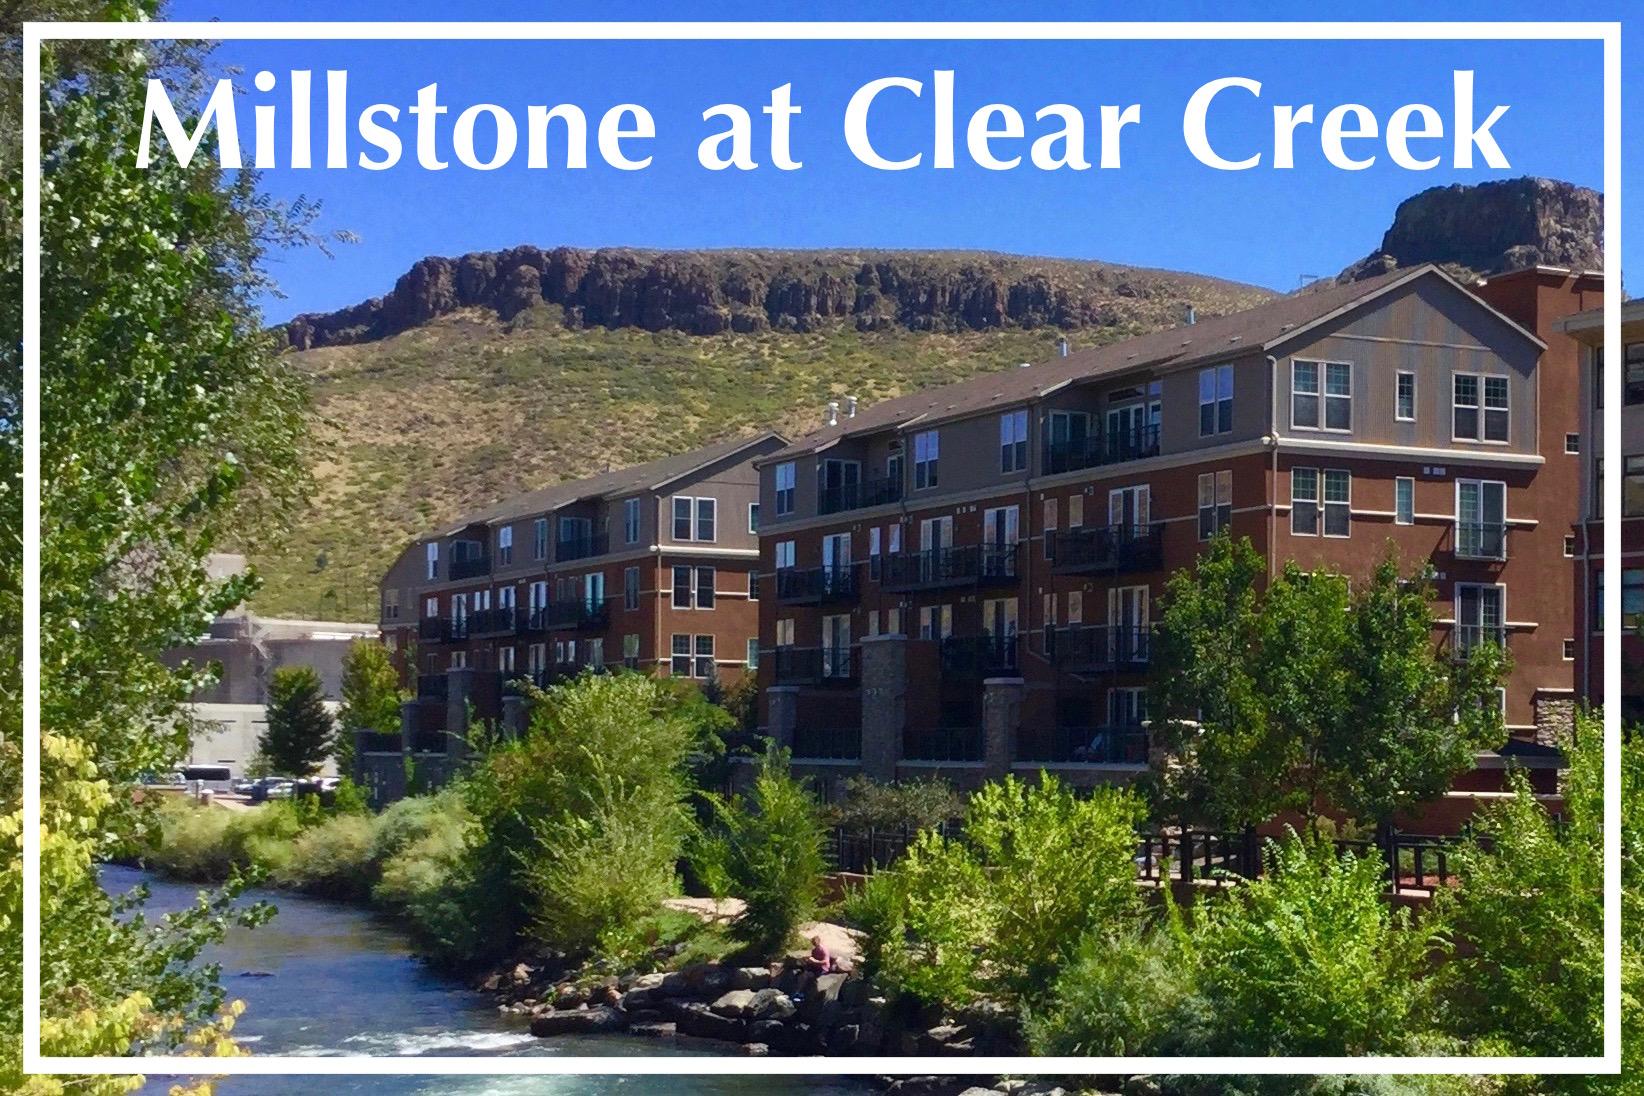 Millstone at Clear Creek.jpg